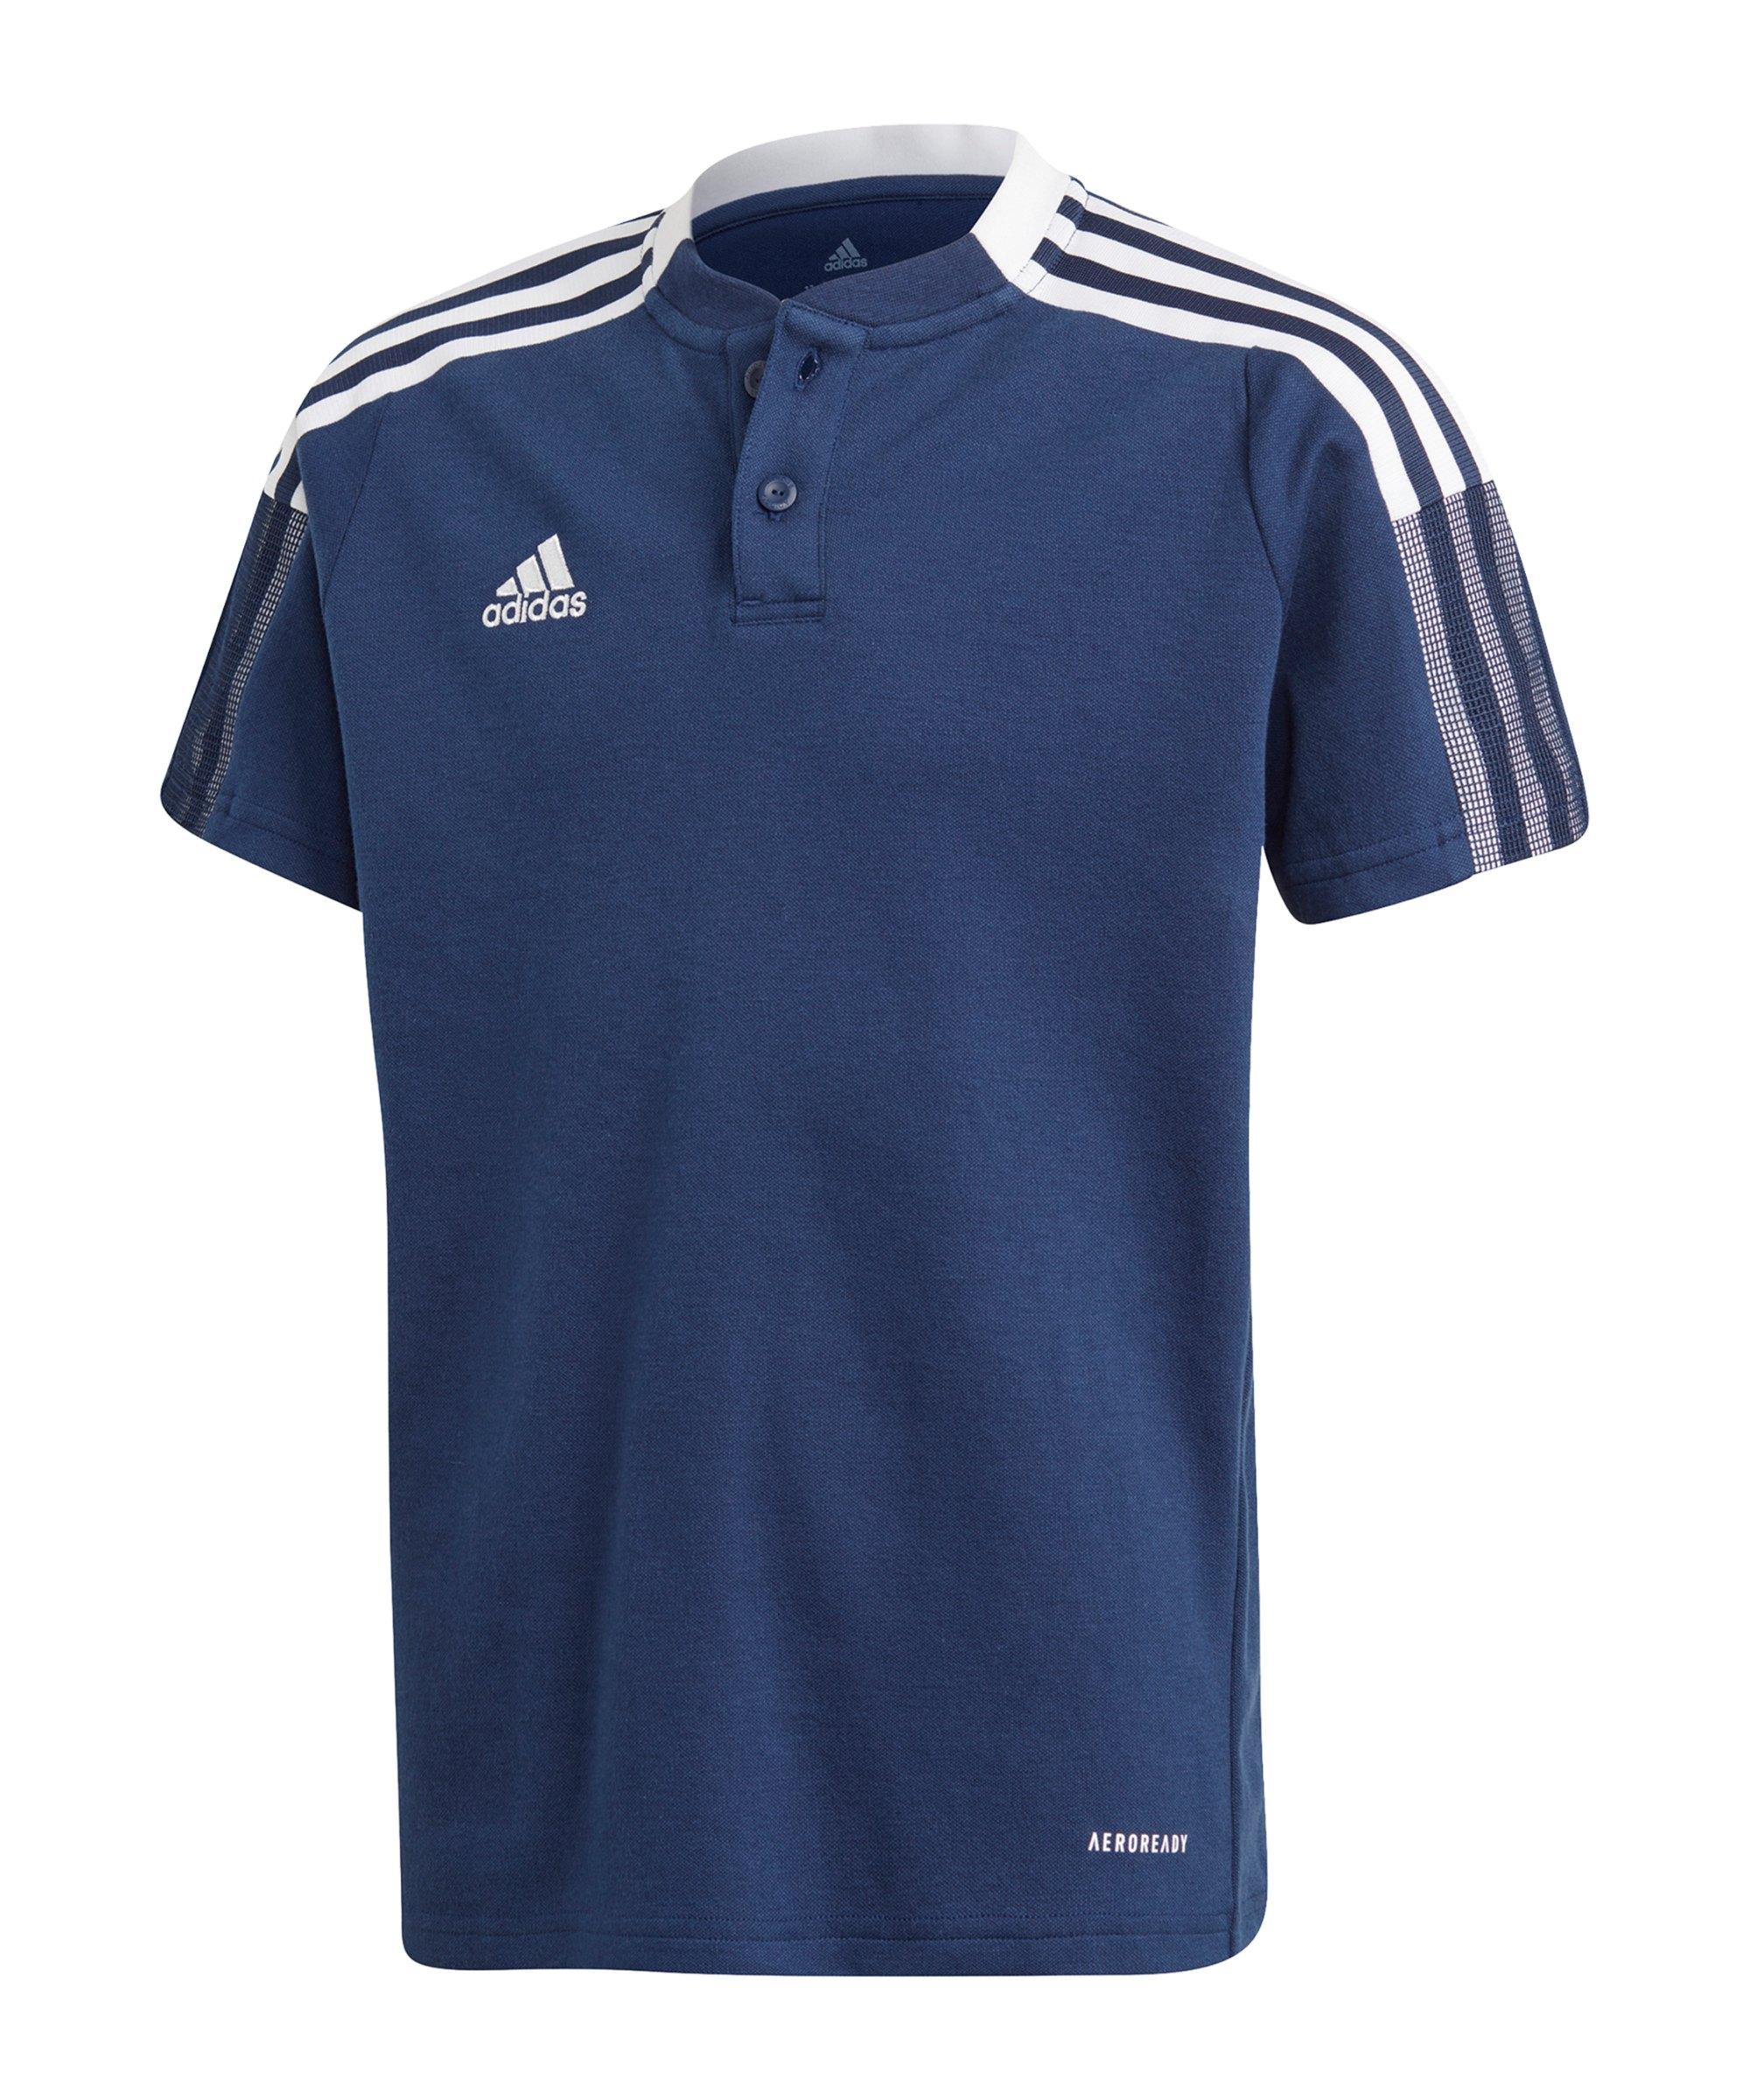 adidas Tiro 21 Poloshirt Kids Dunkelblau - blau